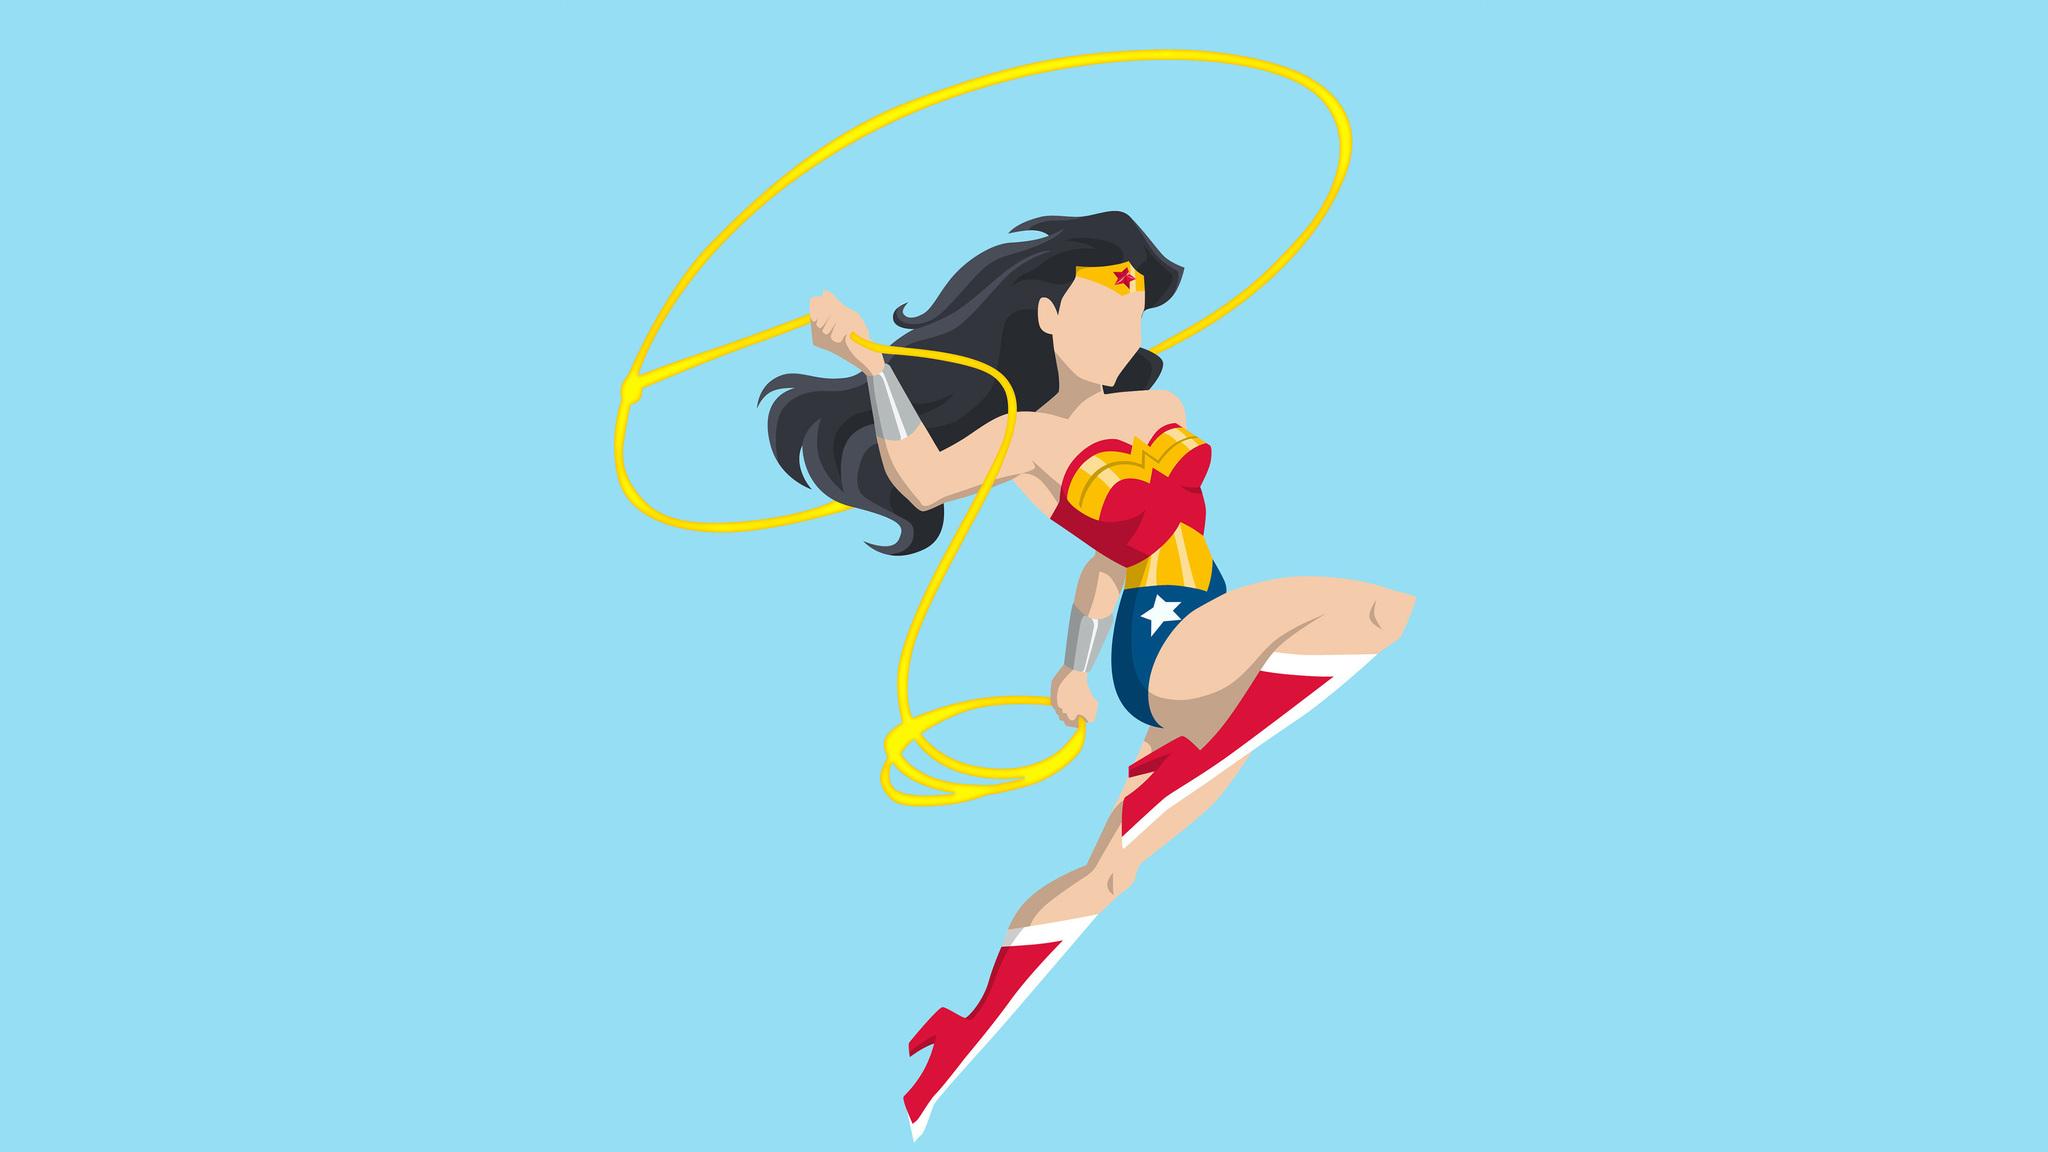 2048x1152 2048x1152 Wonder Woman Vector Style 2048x1152 Resolution Hd 4k